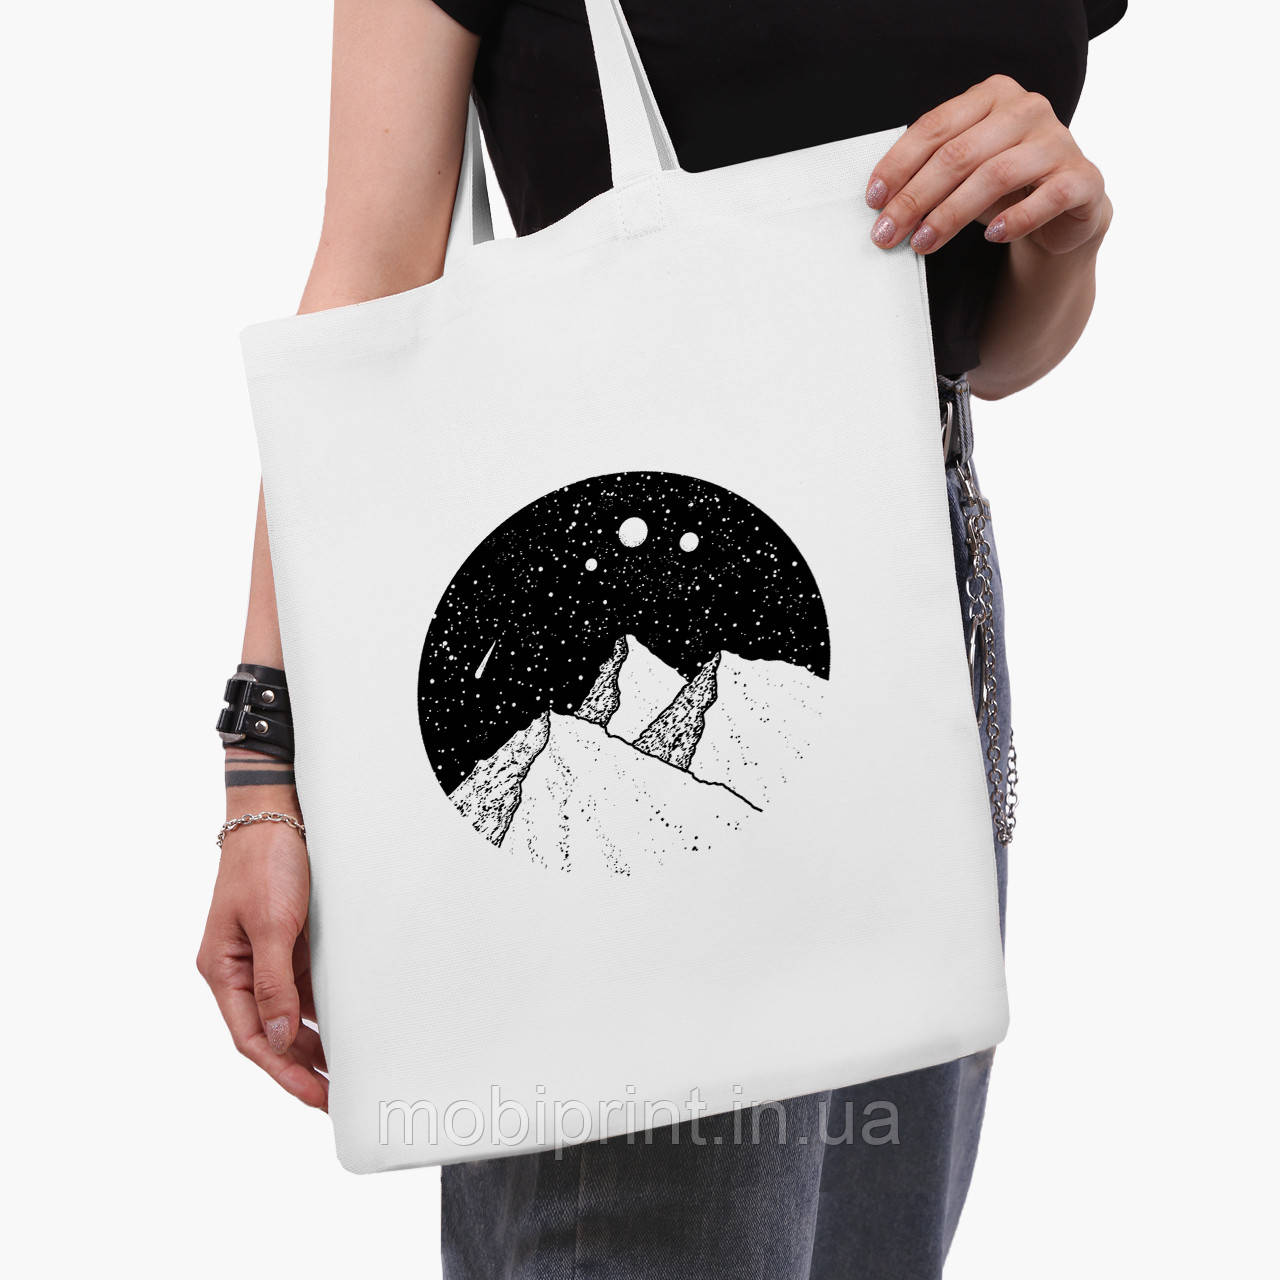 Еко сумка шоппер біла Зоряні гори (Starry mountains) (9227-2846-3) 41*35 см